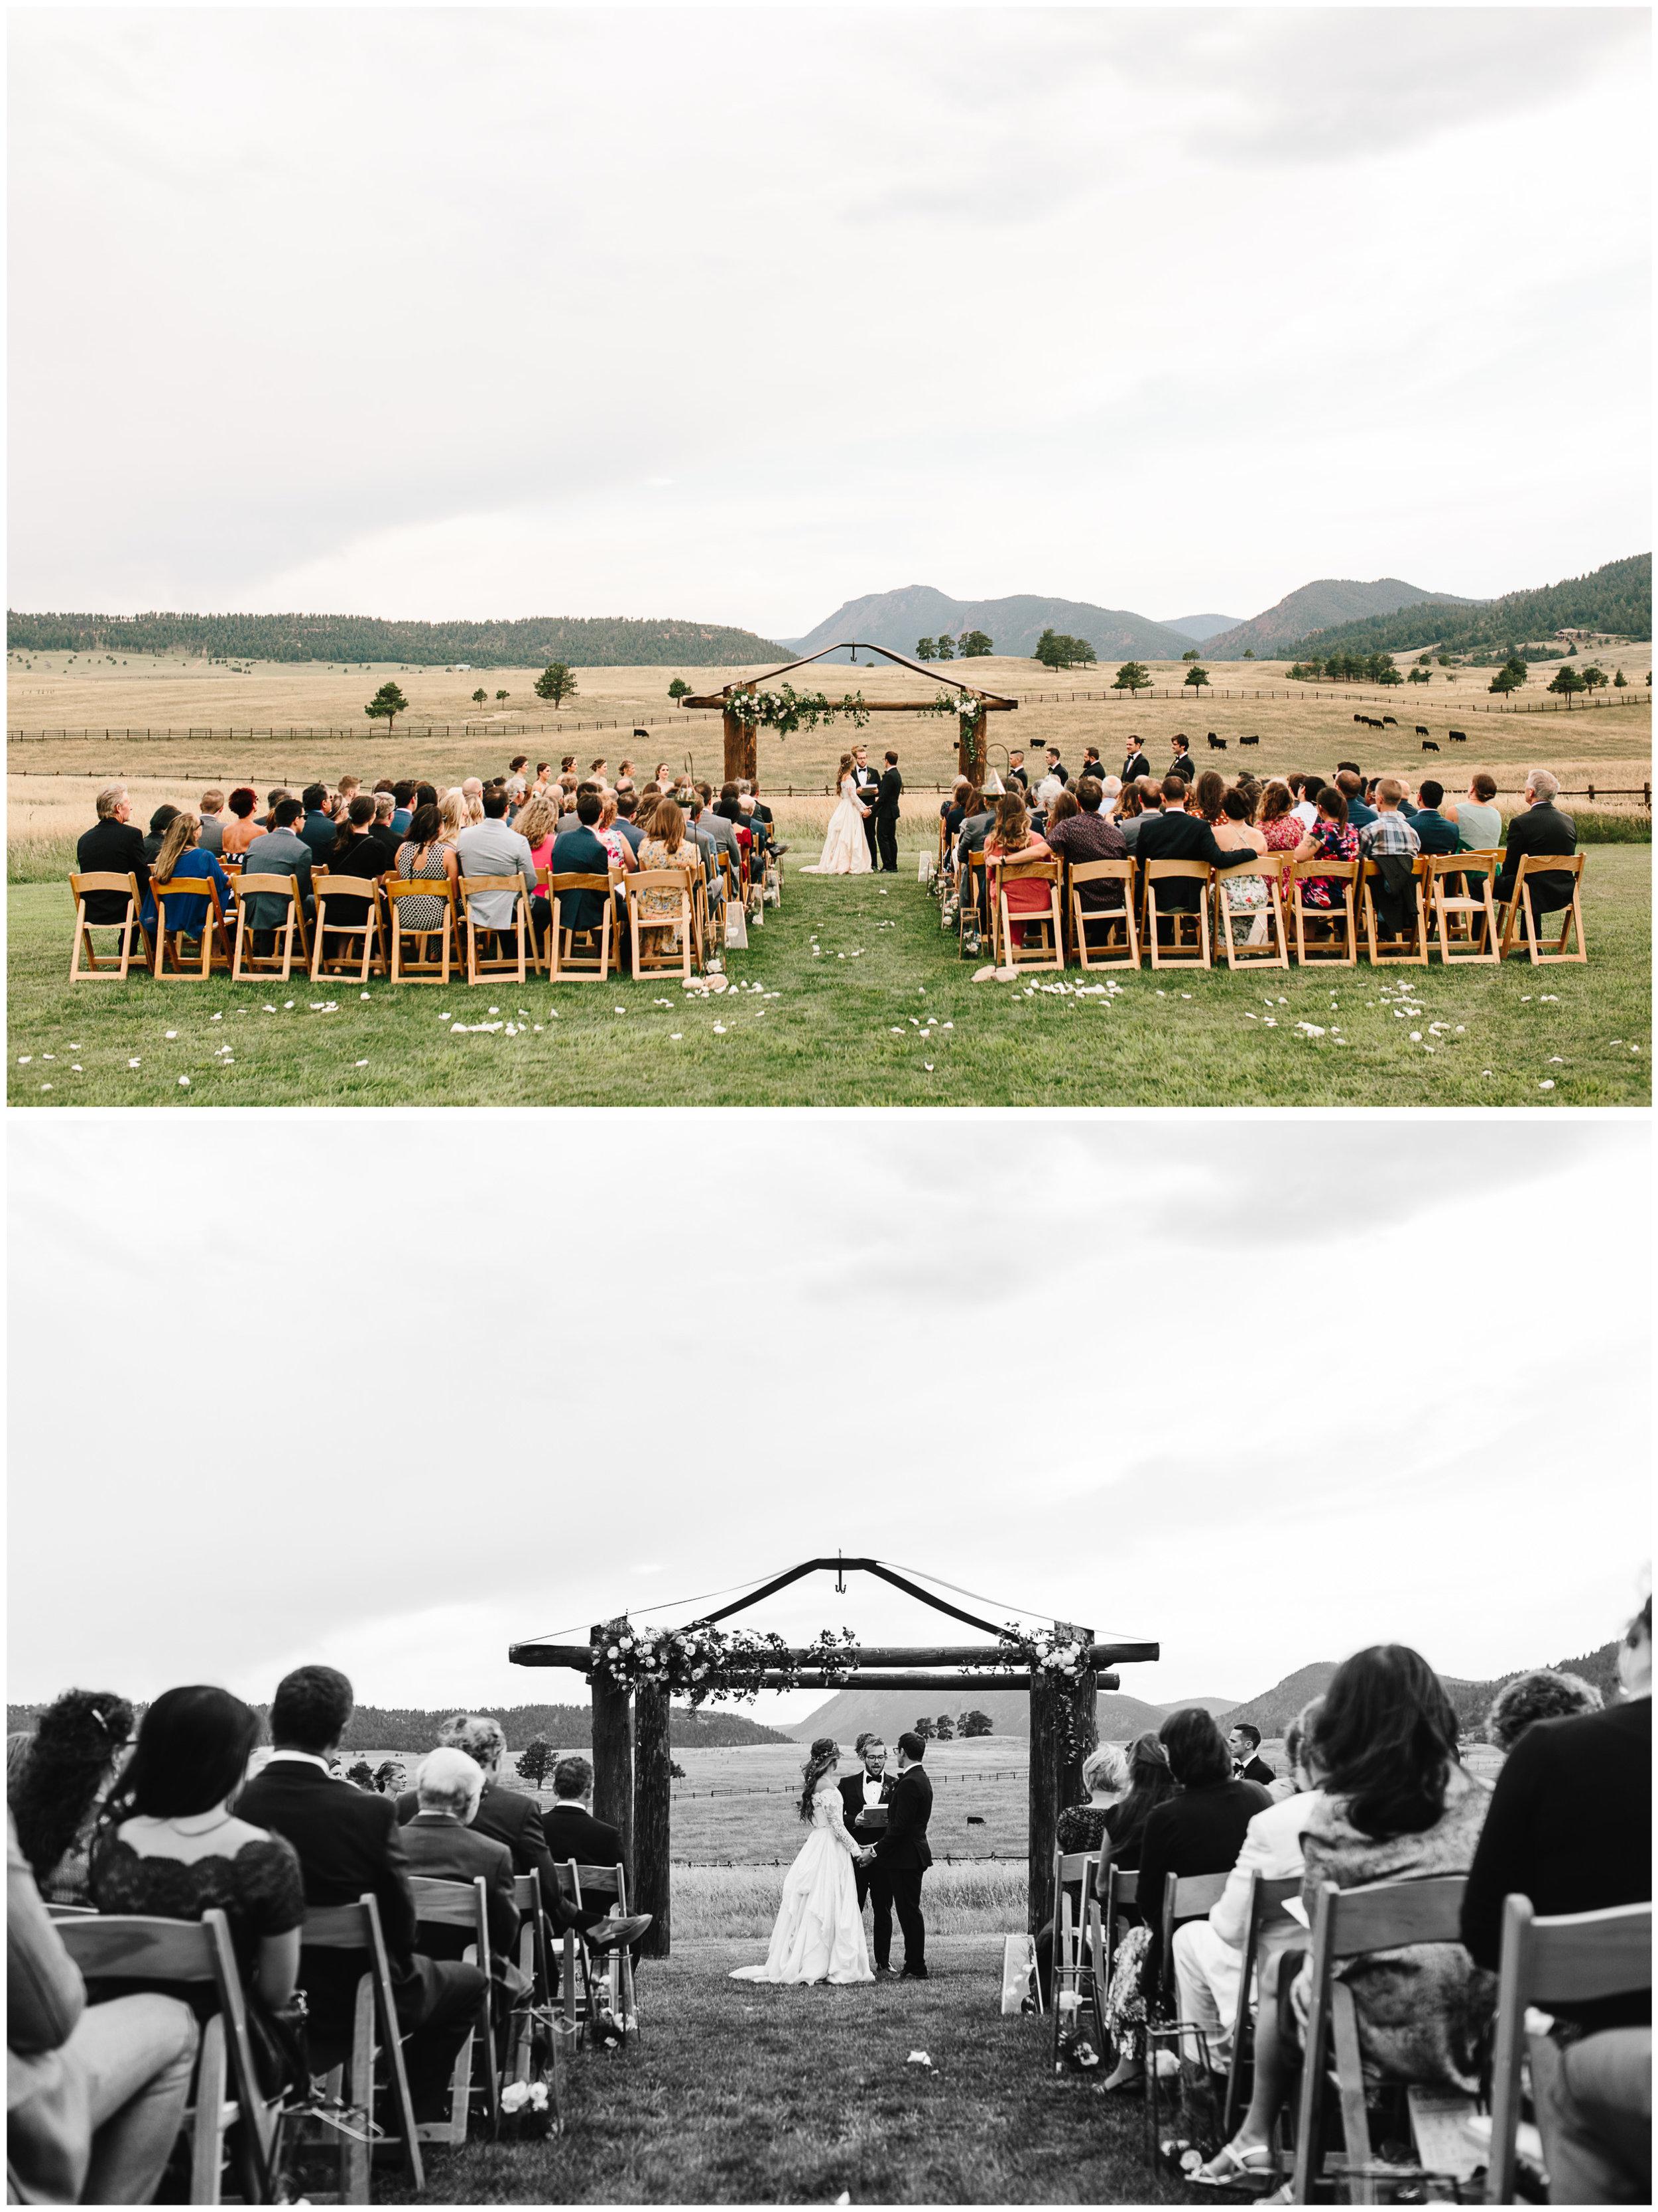 spruce_mountain_ranch_wedding_55.jpg